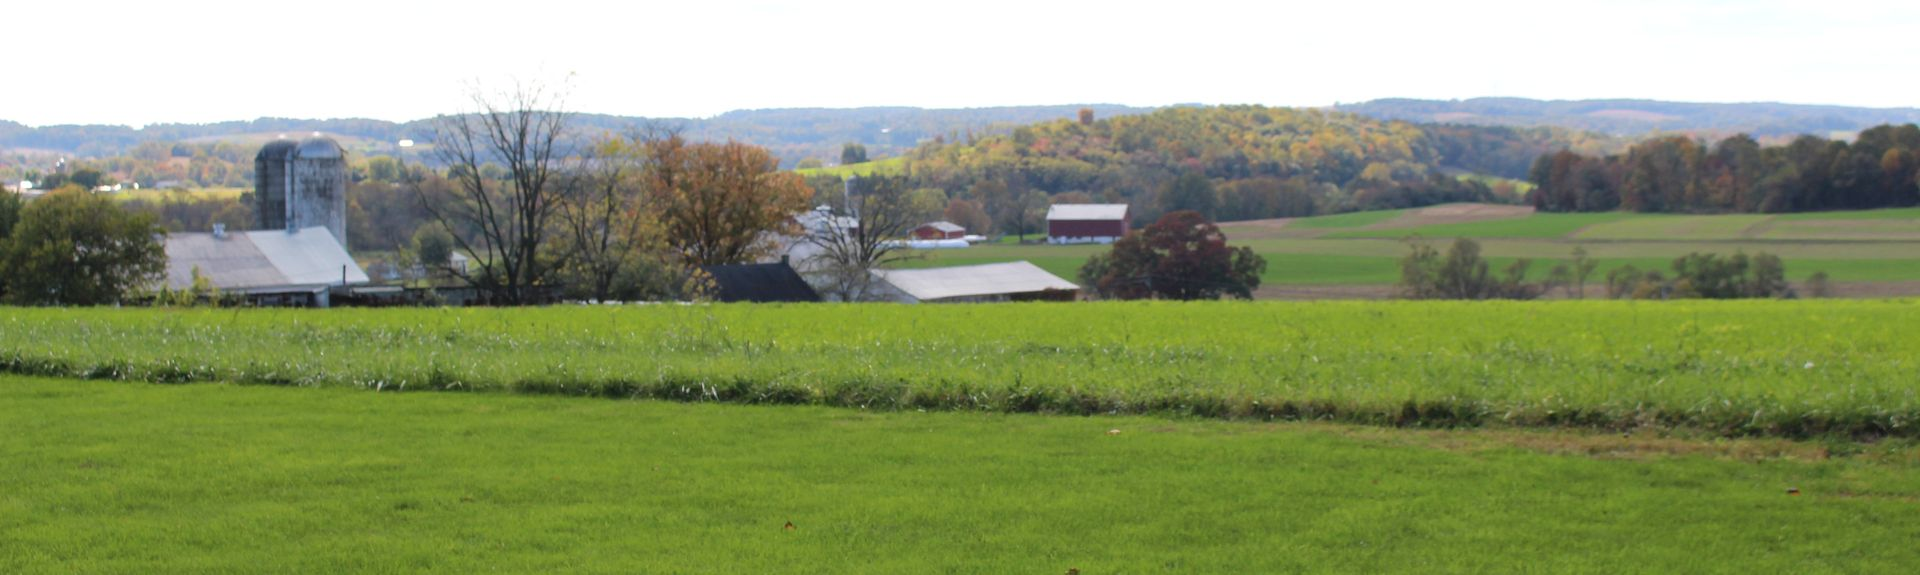 Dutch Wonderland, Lancaster, Pennsylvania, United States of America